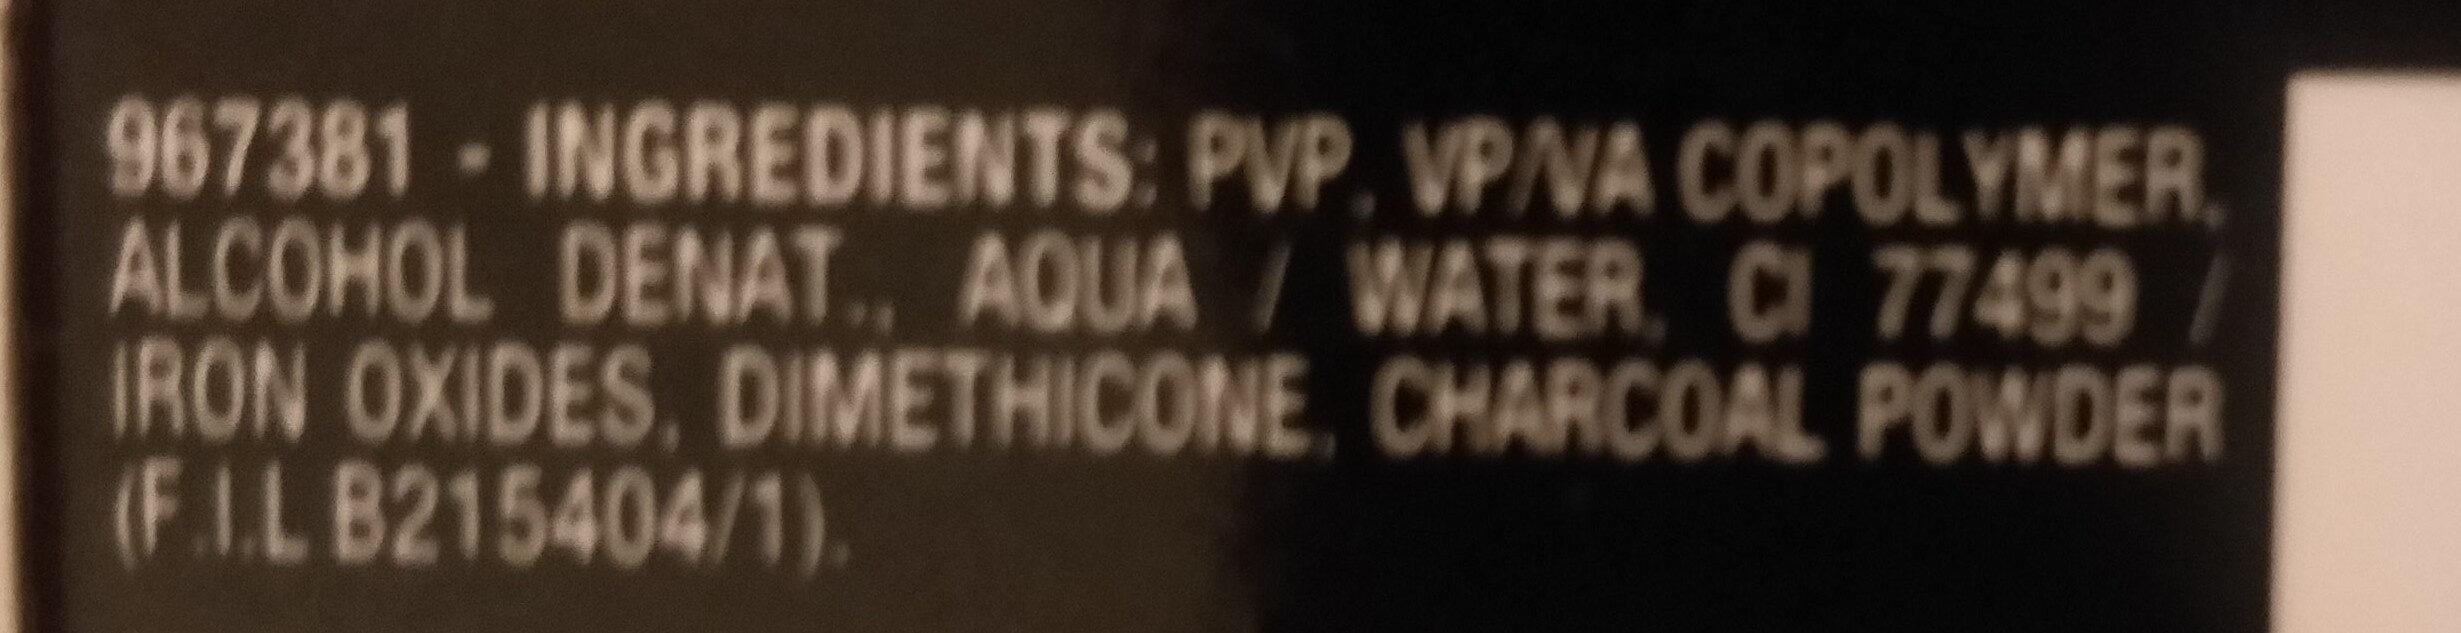 Pure Active Hautklar Carbone - Ingredients - it